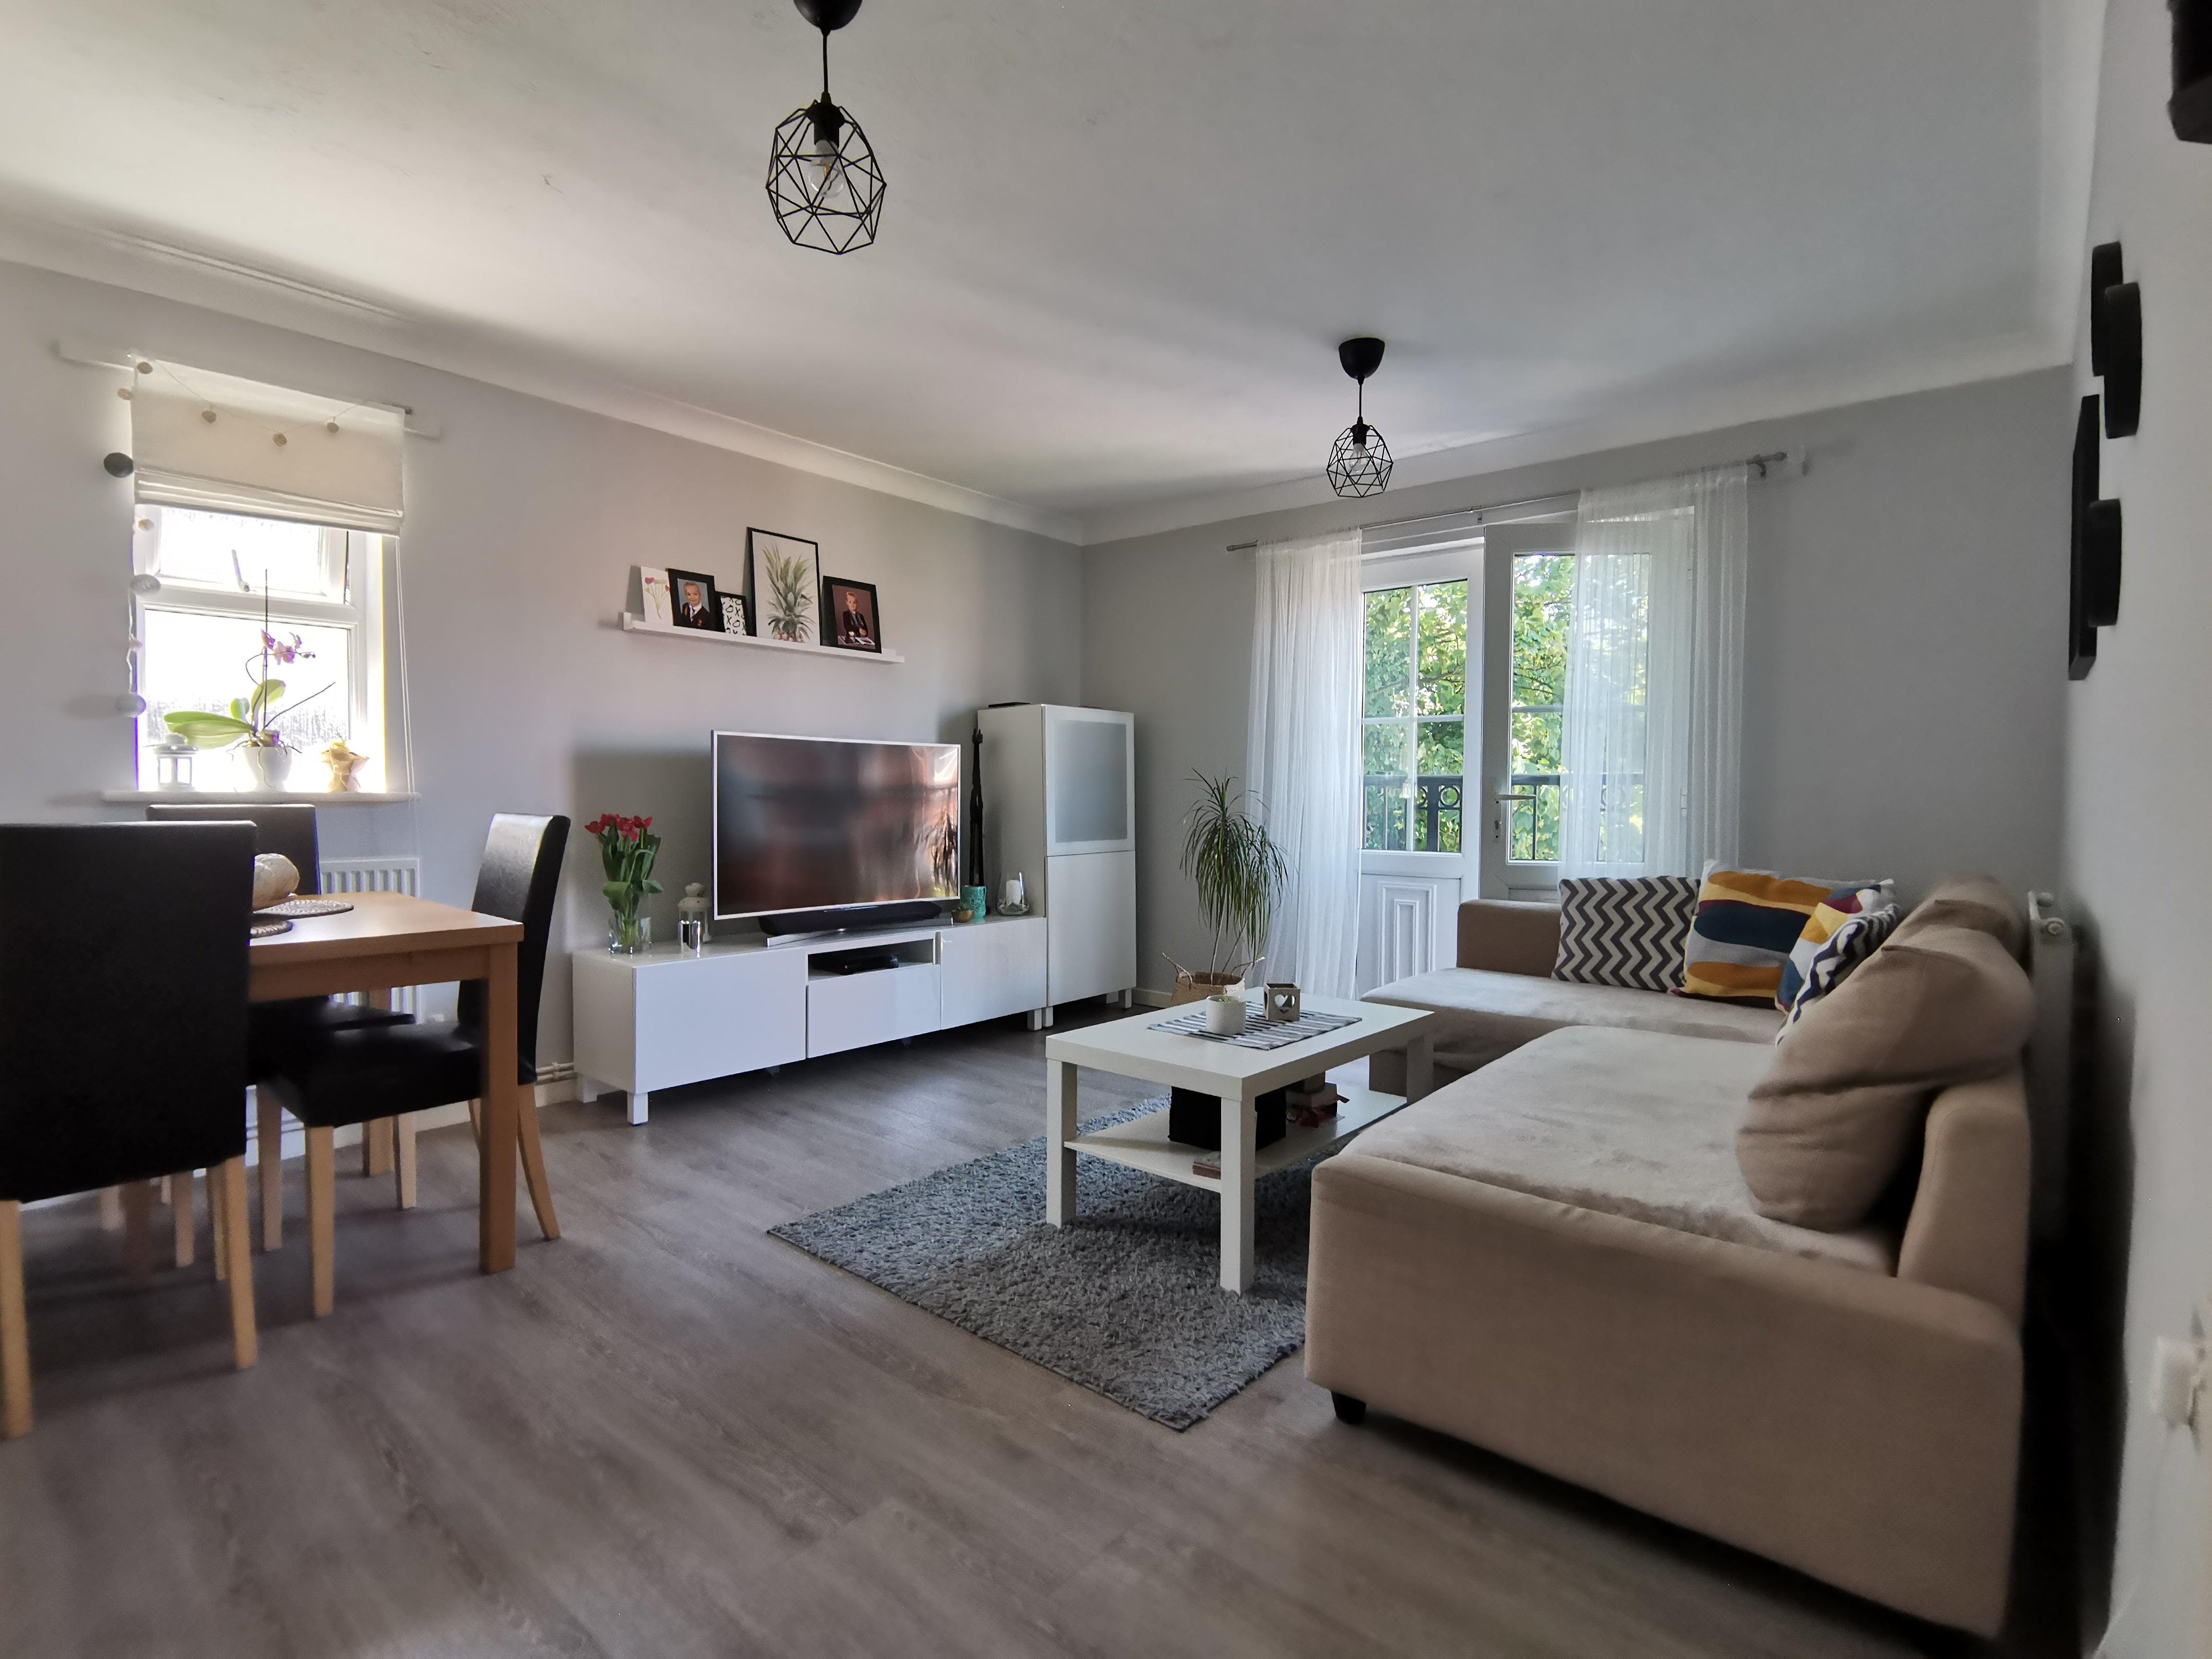 Flat 12 Heathcote Court, Heathcote Road - Living room